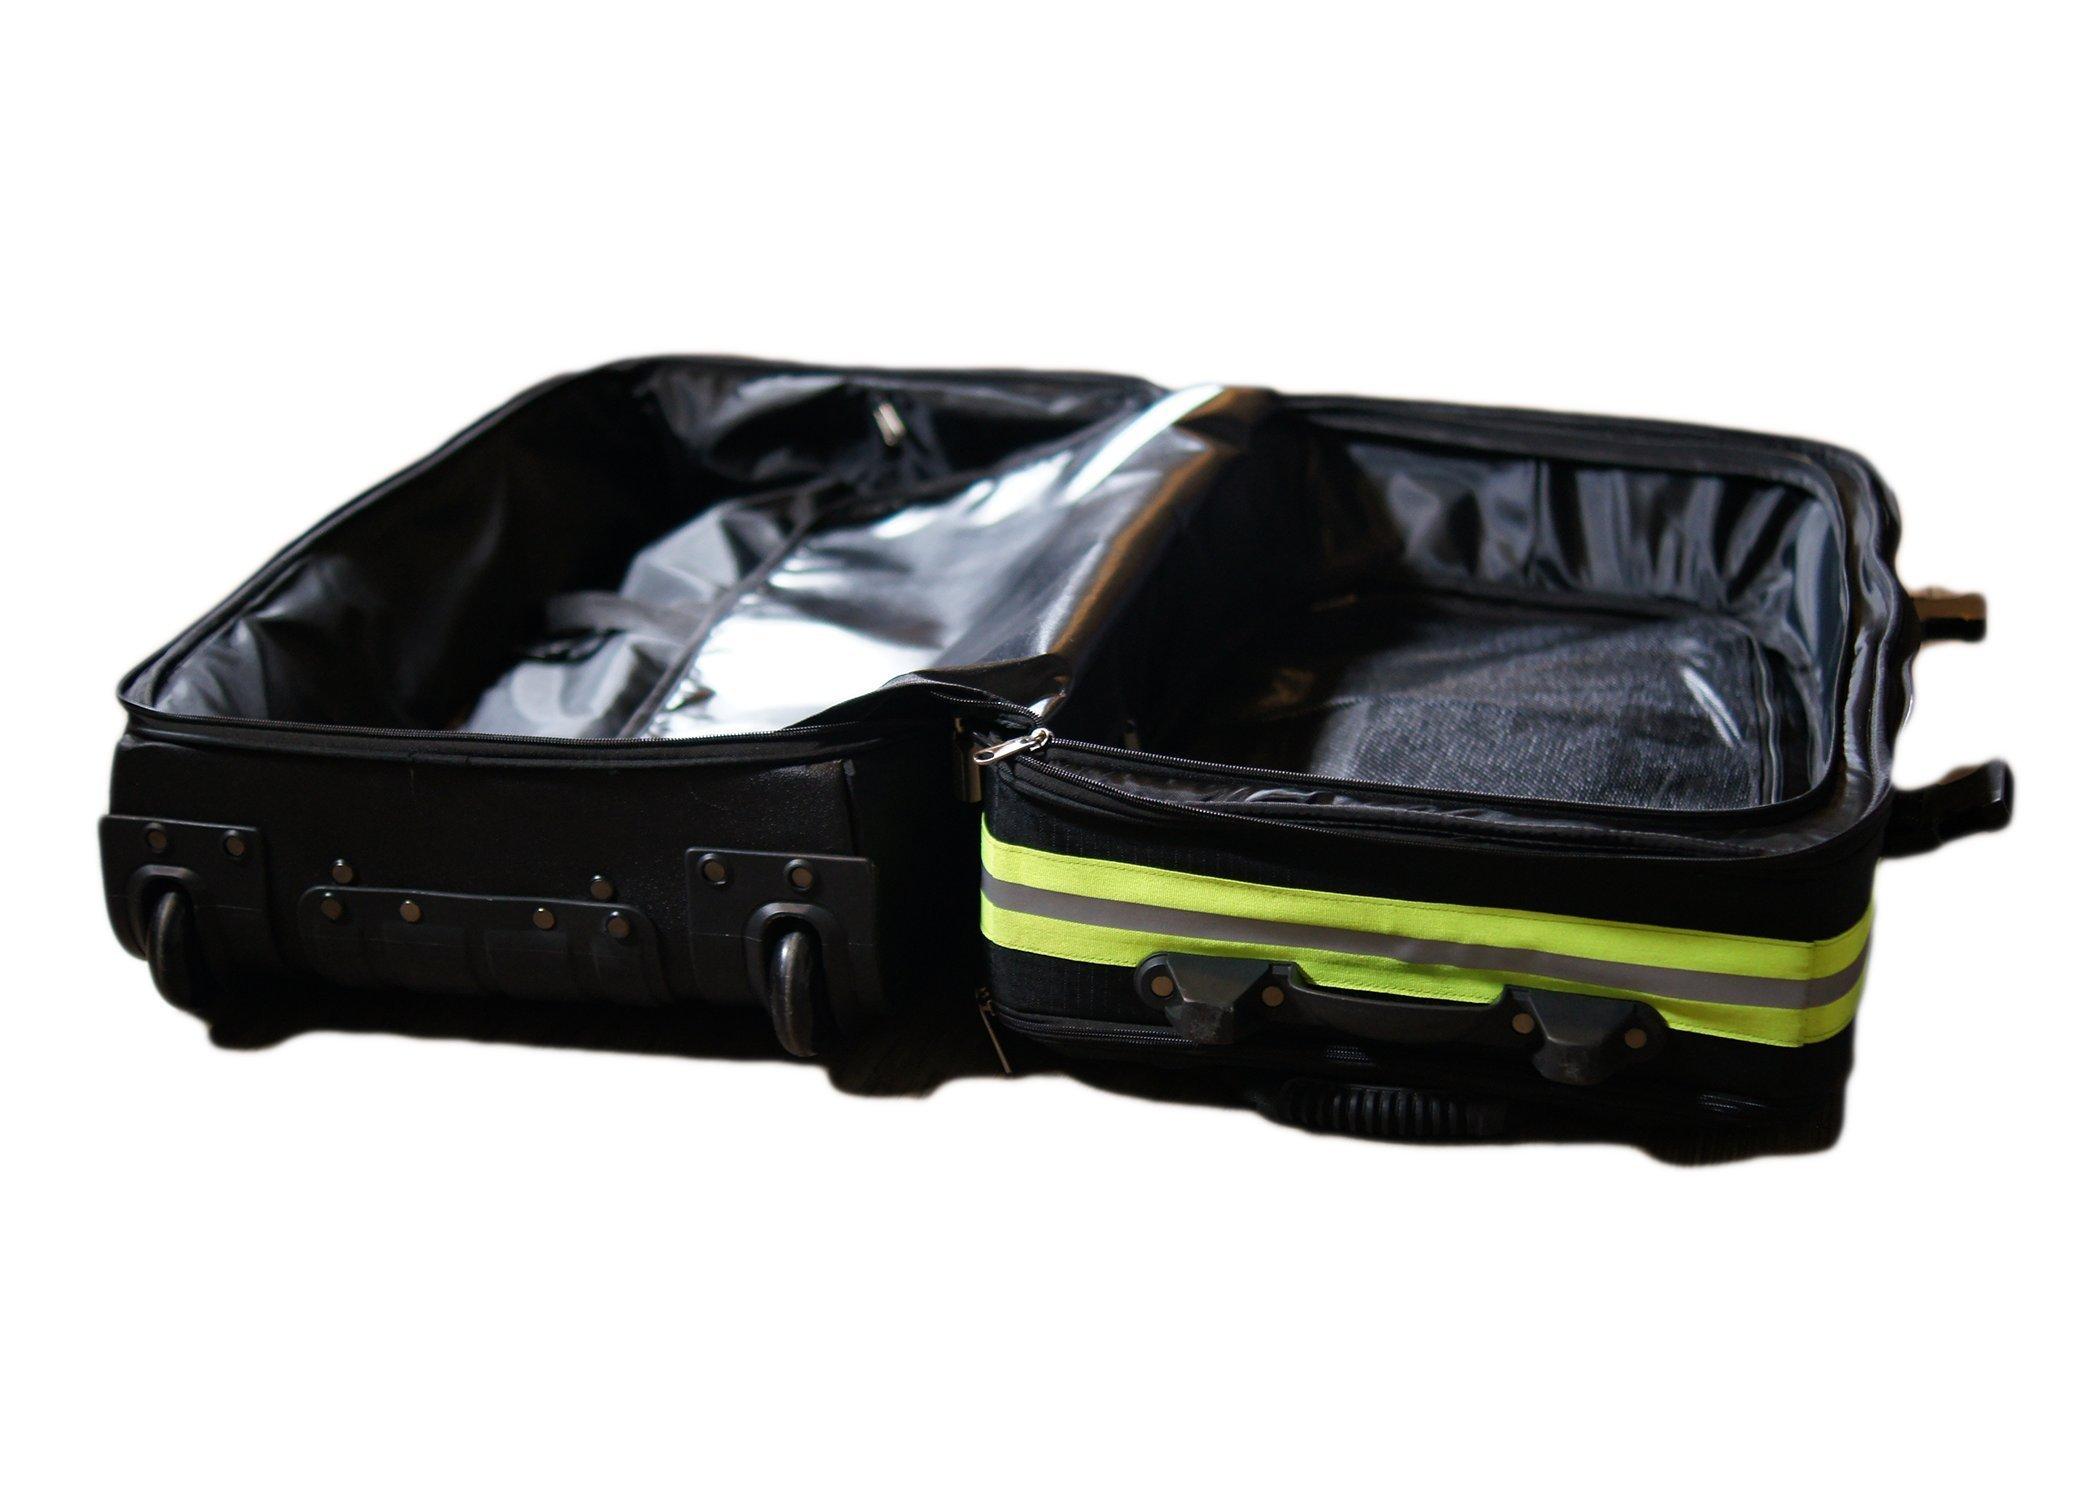 Fireflex Firefighter Rolling Travel Bag (Black) by Firefighters Merchandise (Image #5)